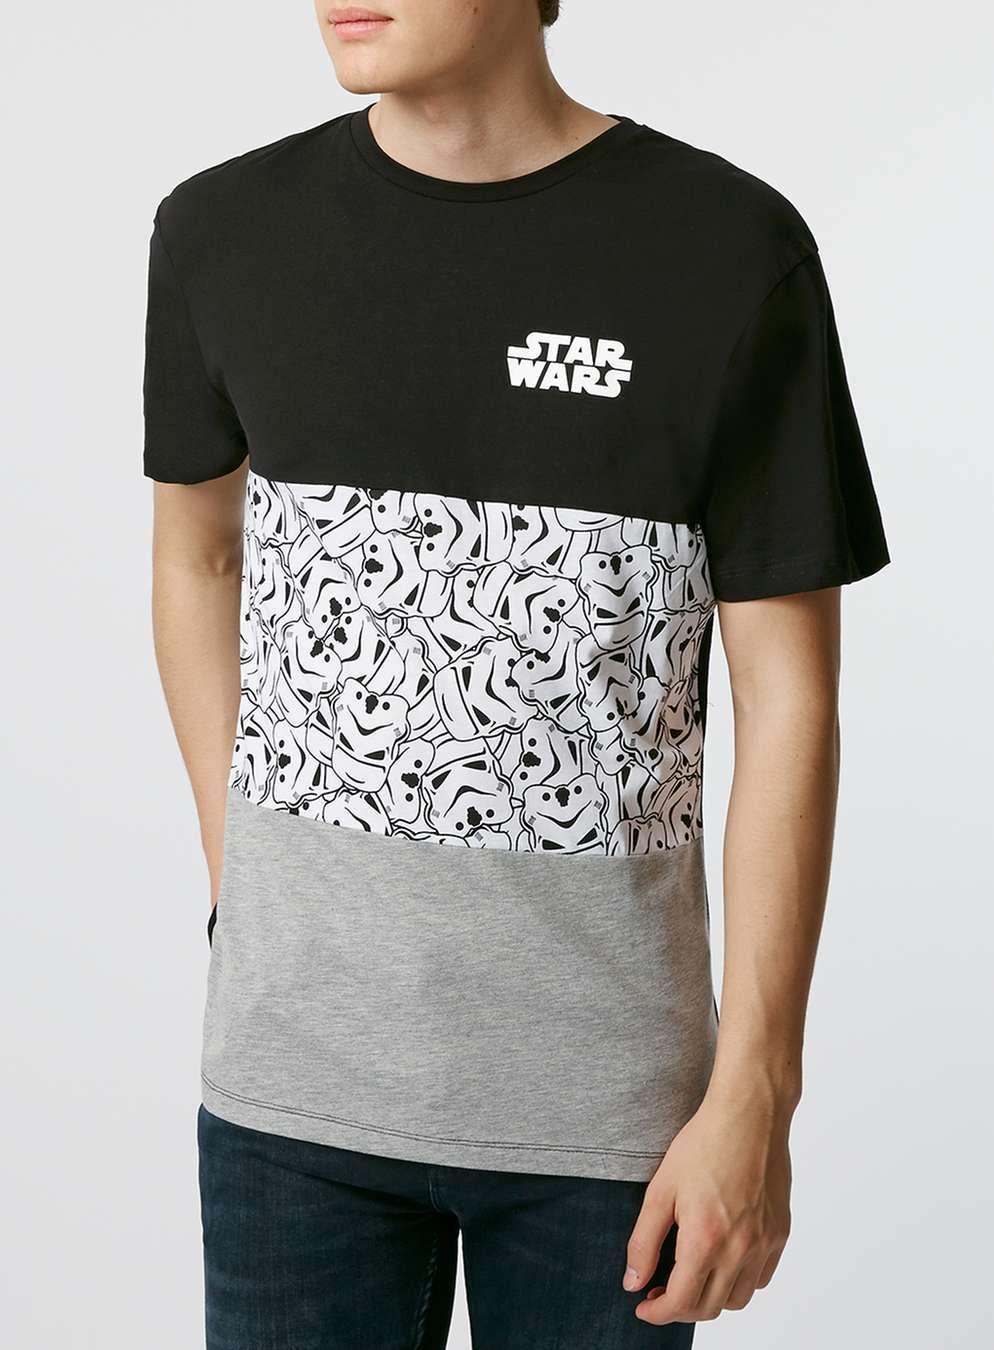 Black Star Wars TShirt T shirt vest, Tank shirt, Shirt